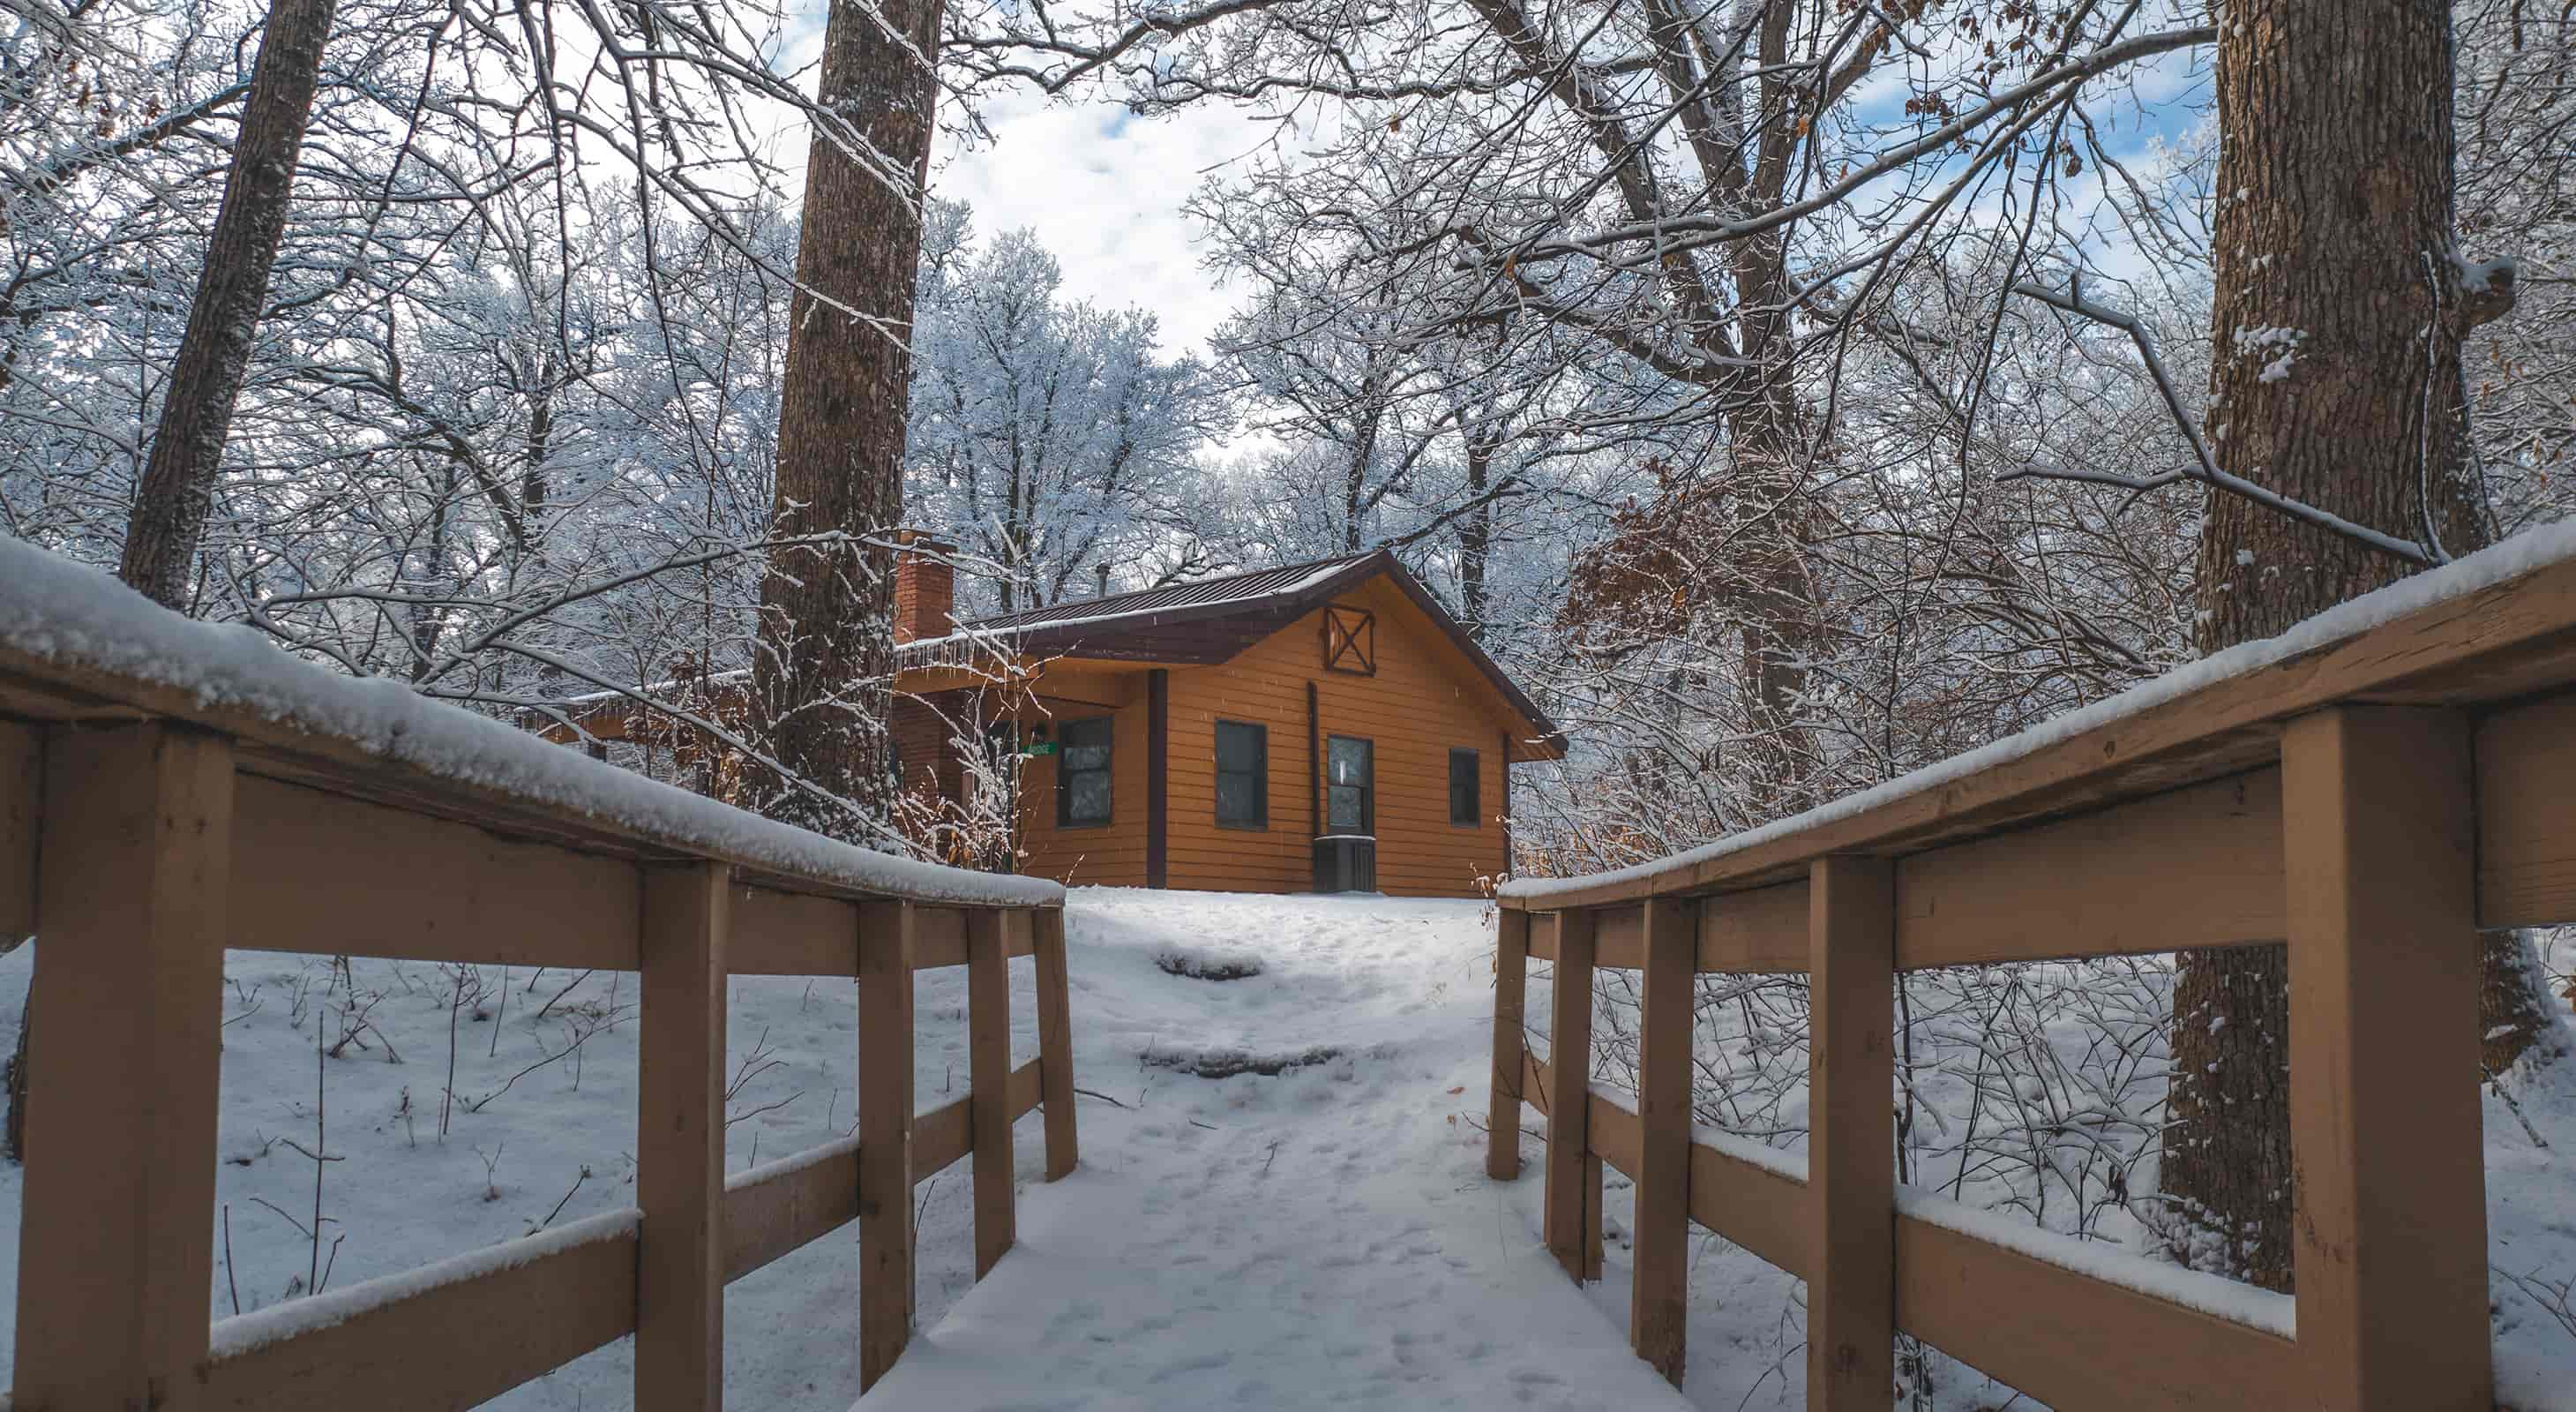 Bridge Cabin in Winter with fresh snow